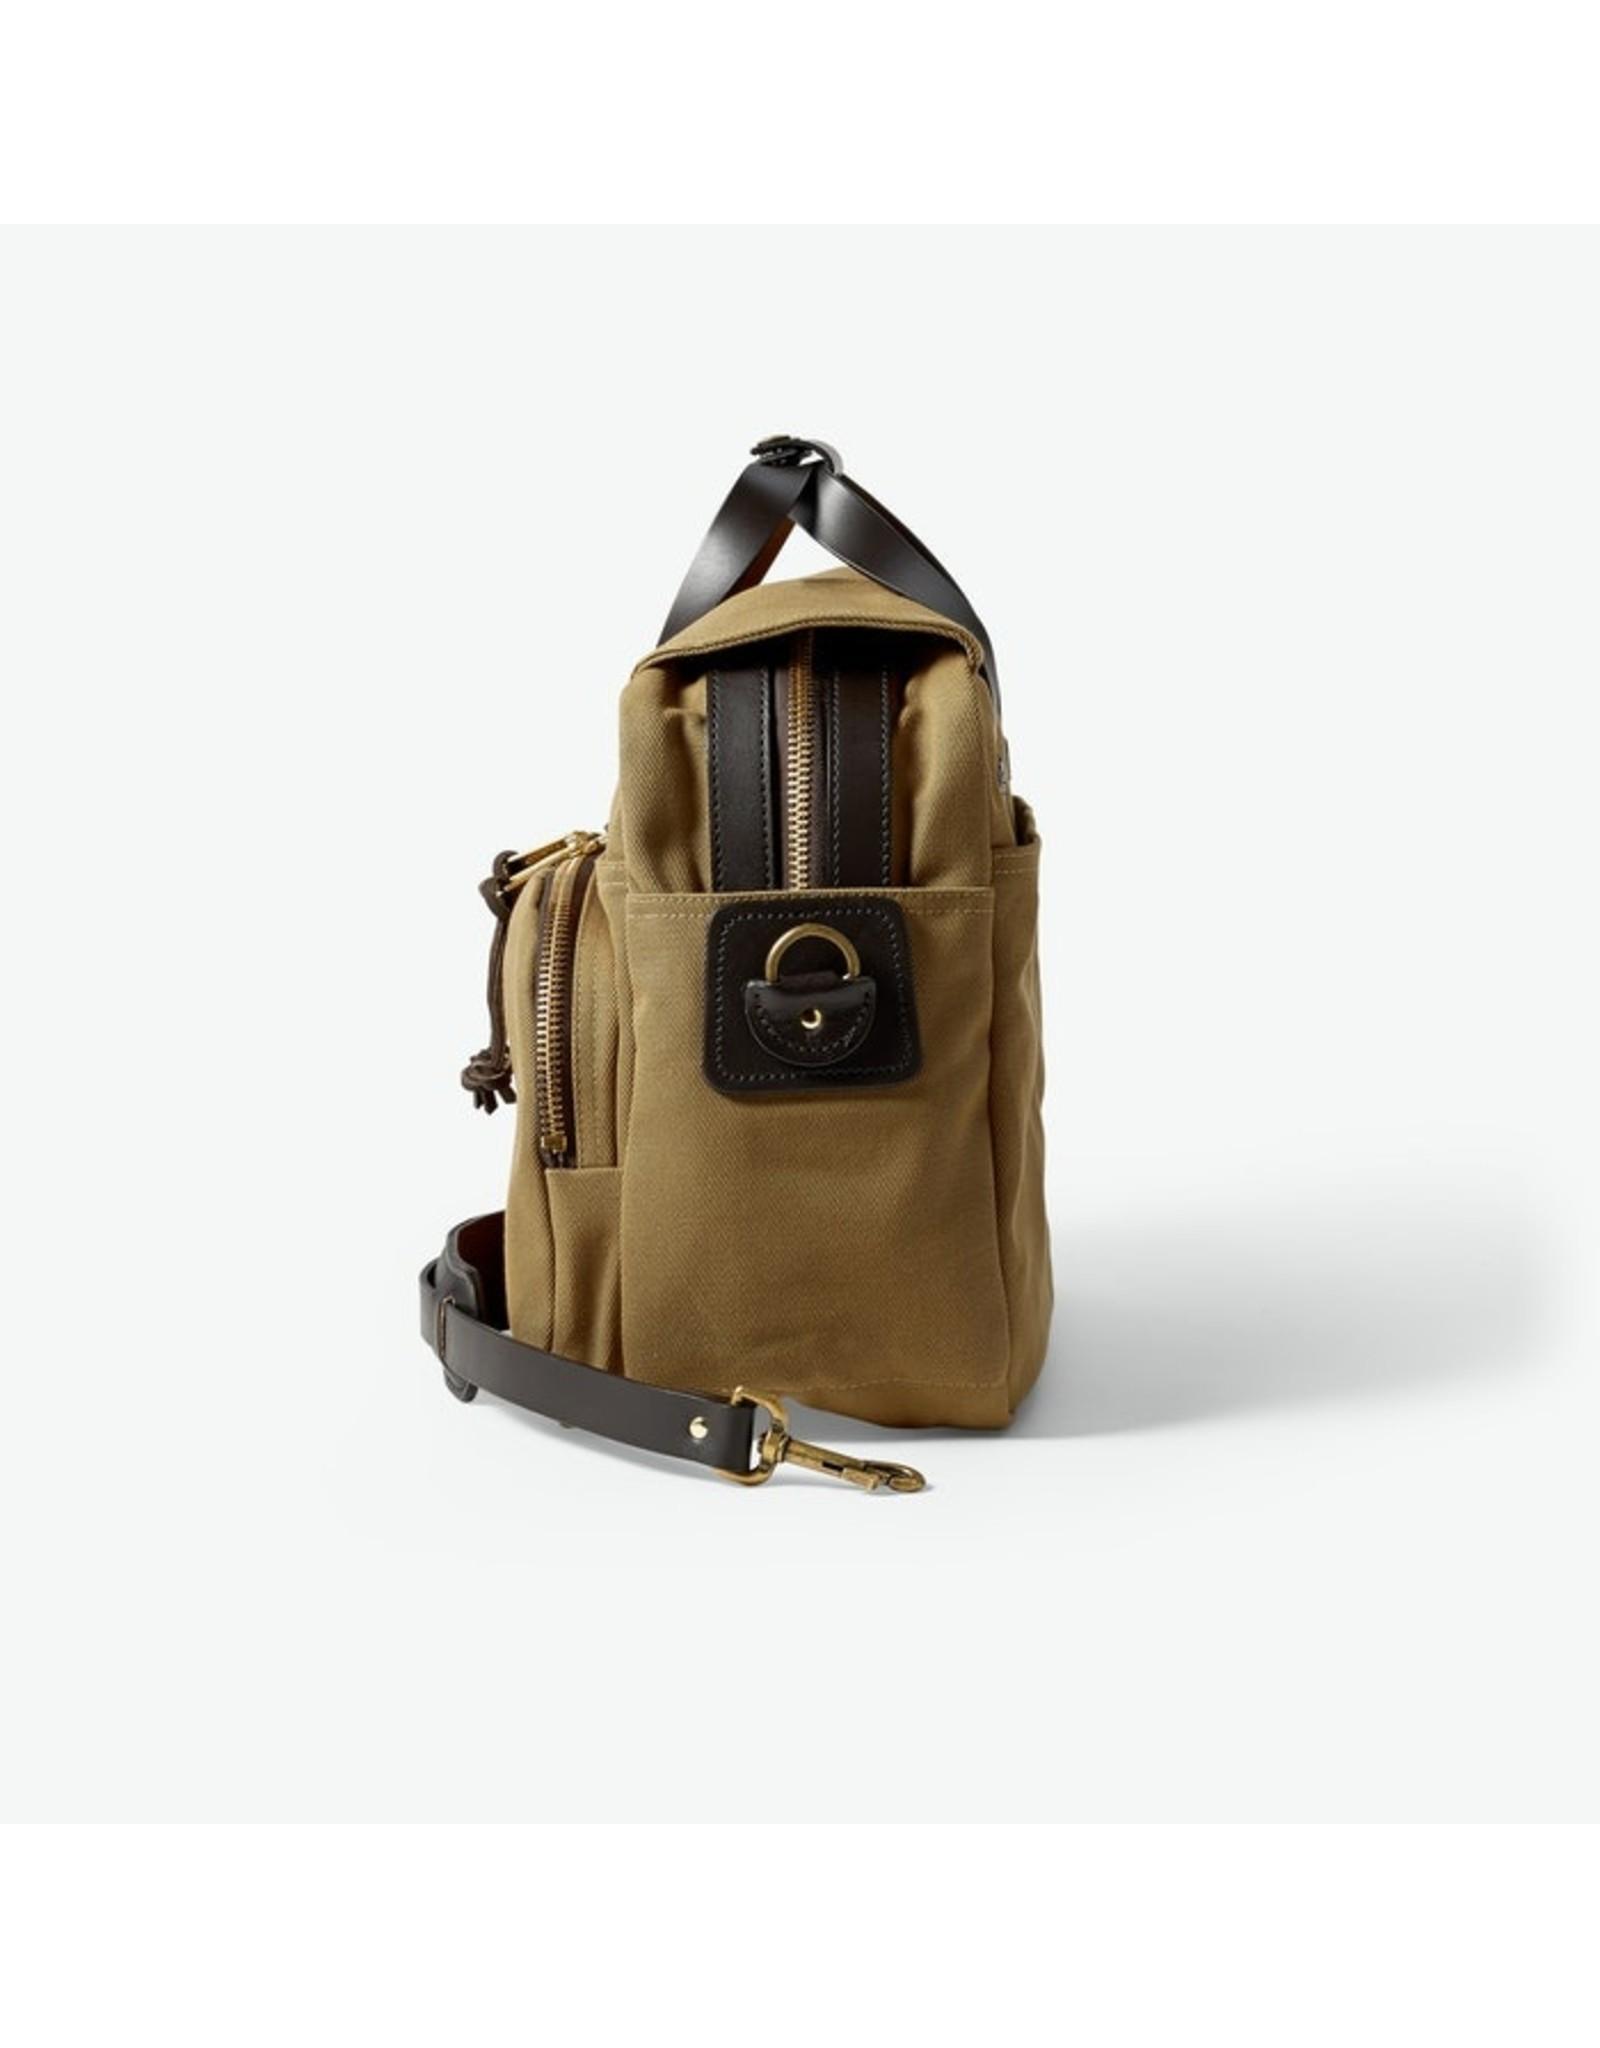 Filson Filson Rugged Twill Padded Computer Bag